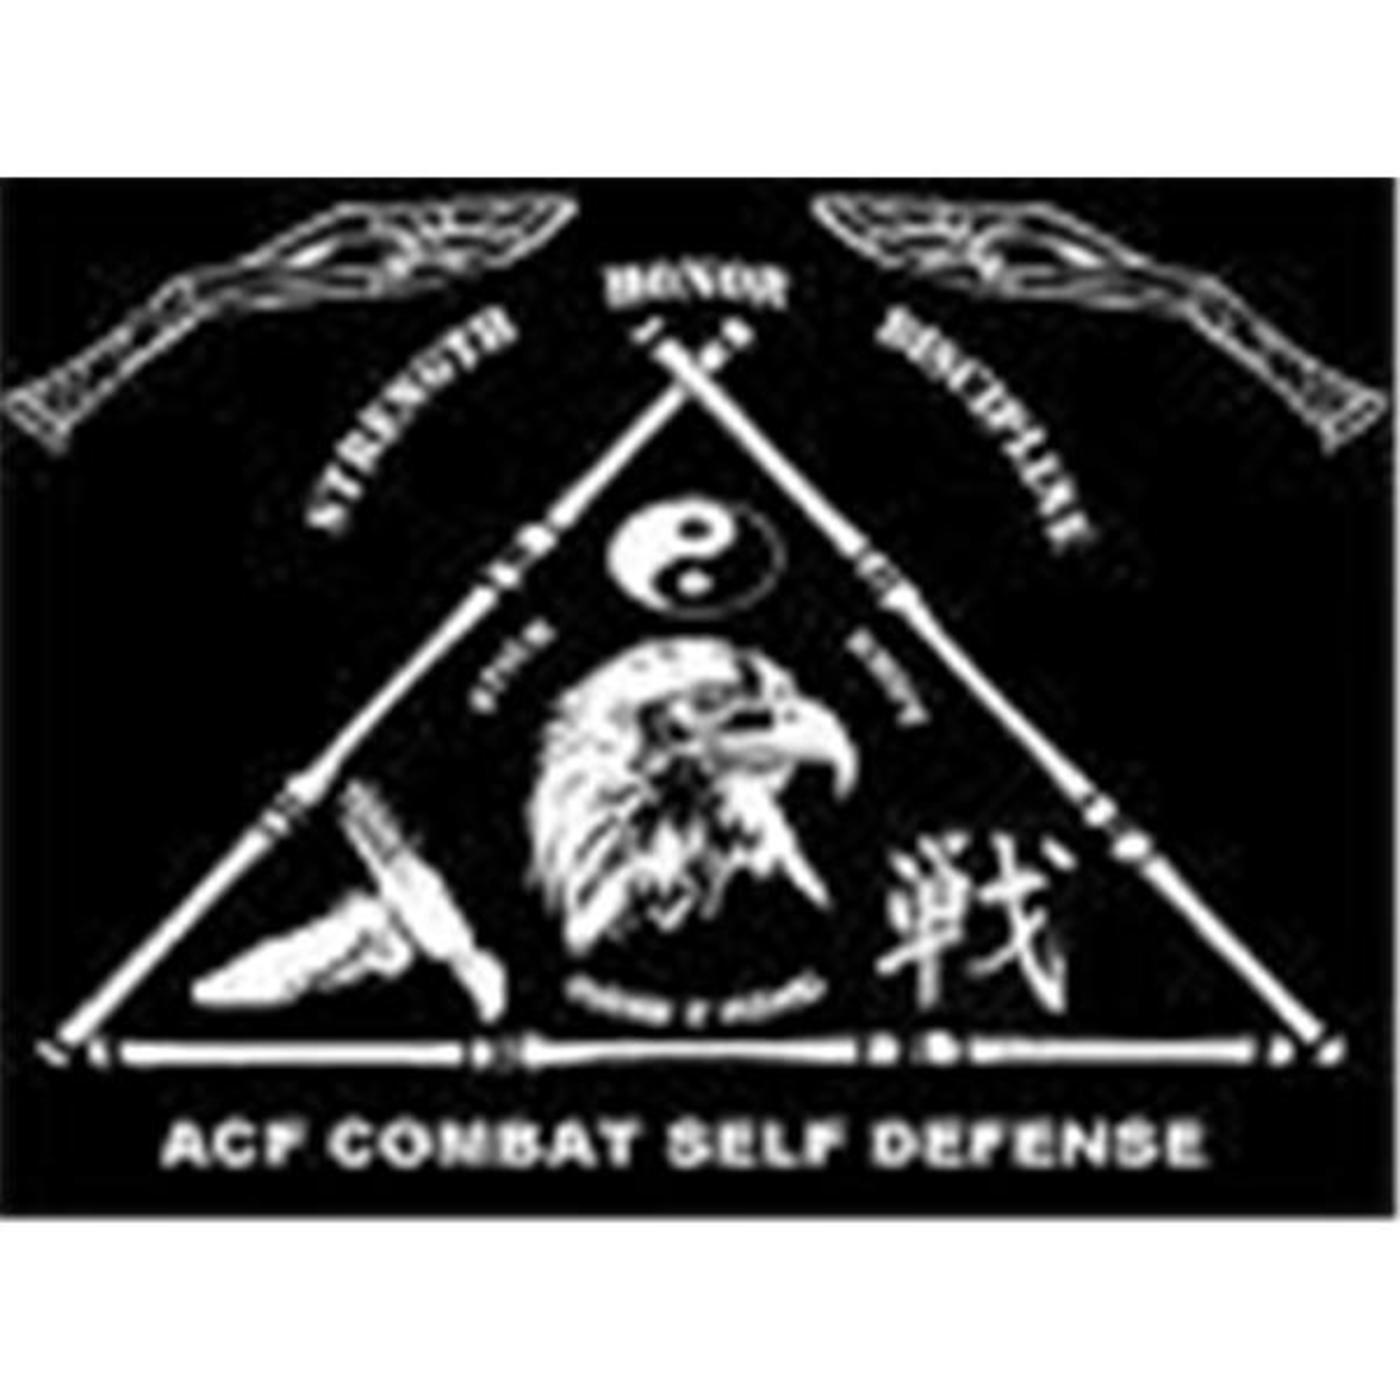 MARTIAL ARTS COMBAT ZONE